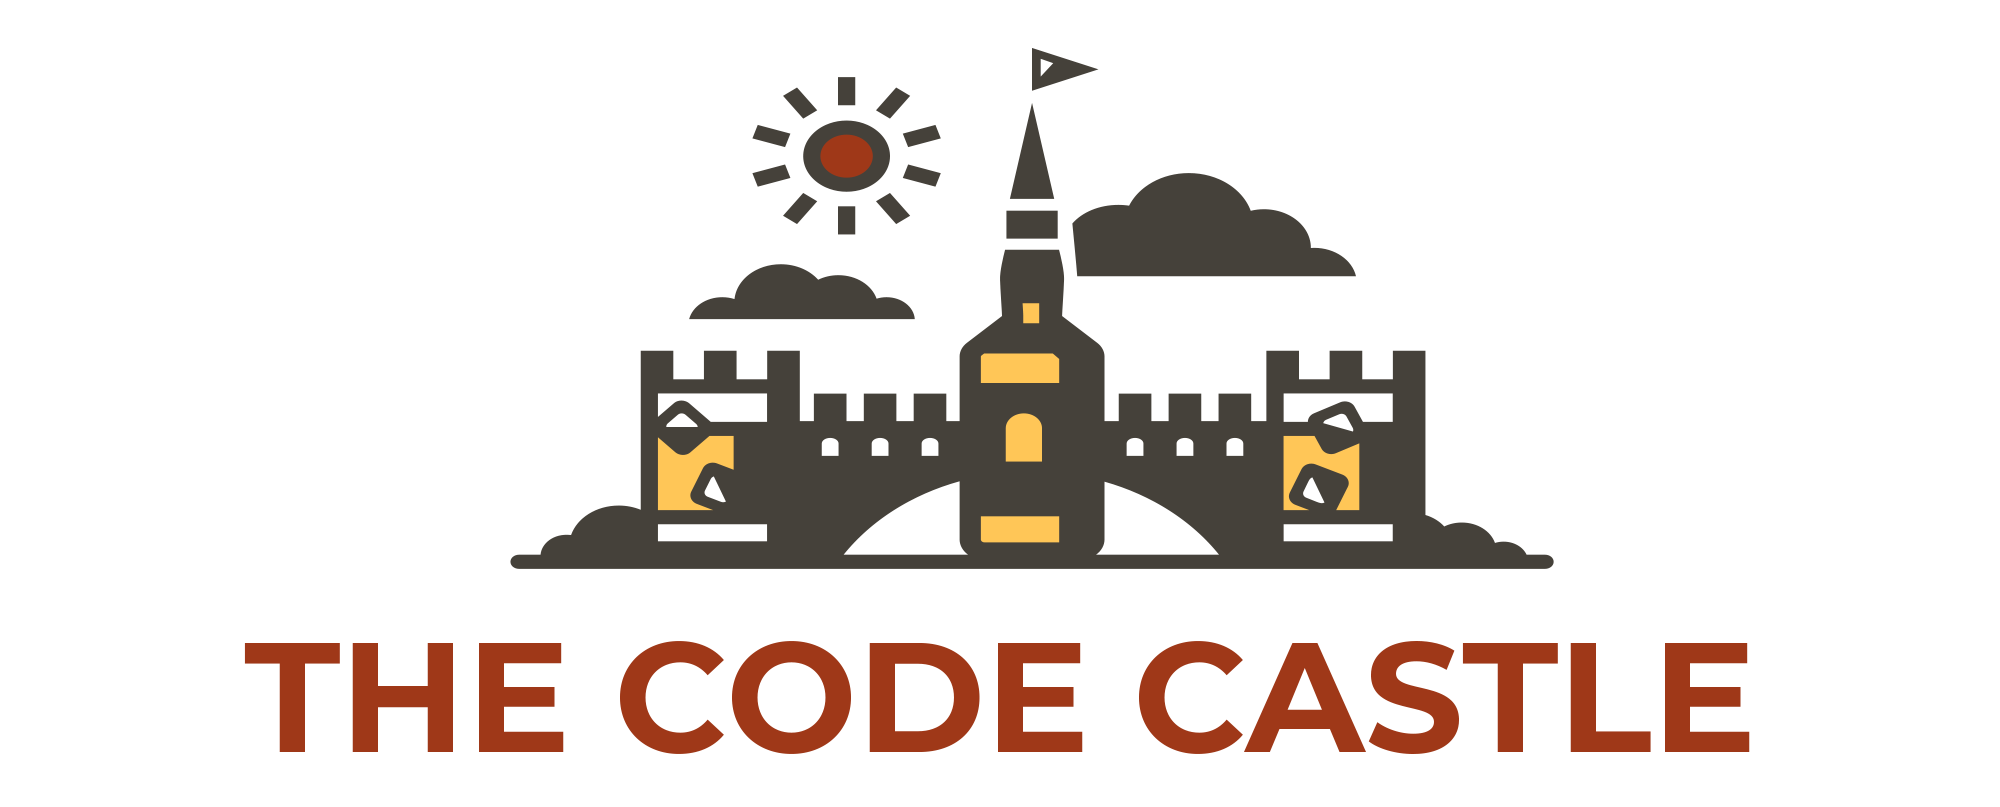 The Code Castle